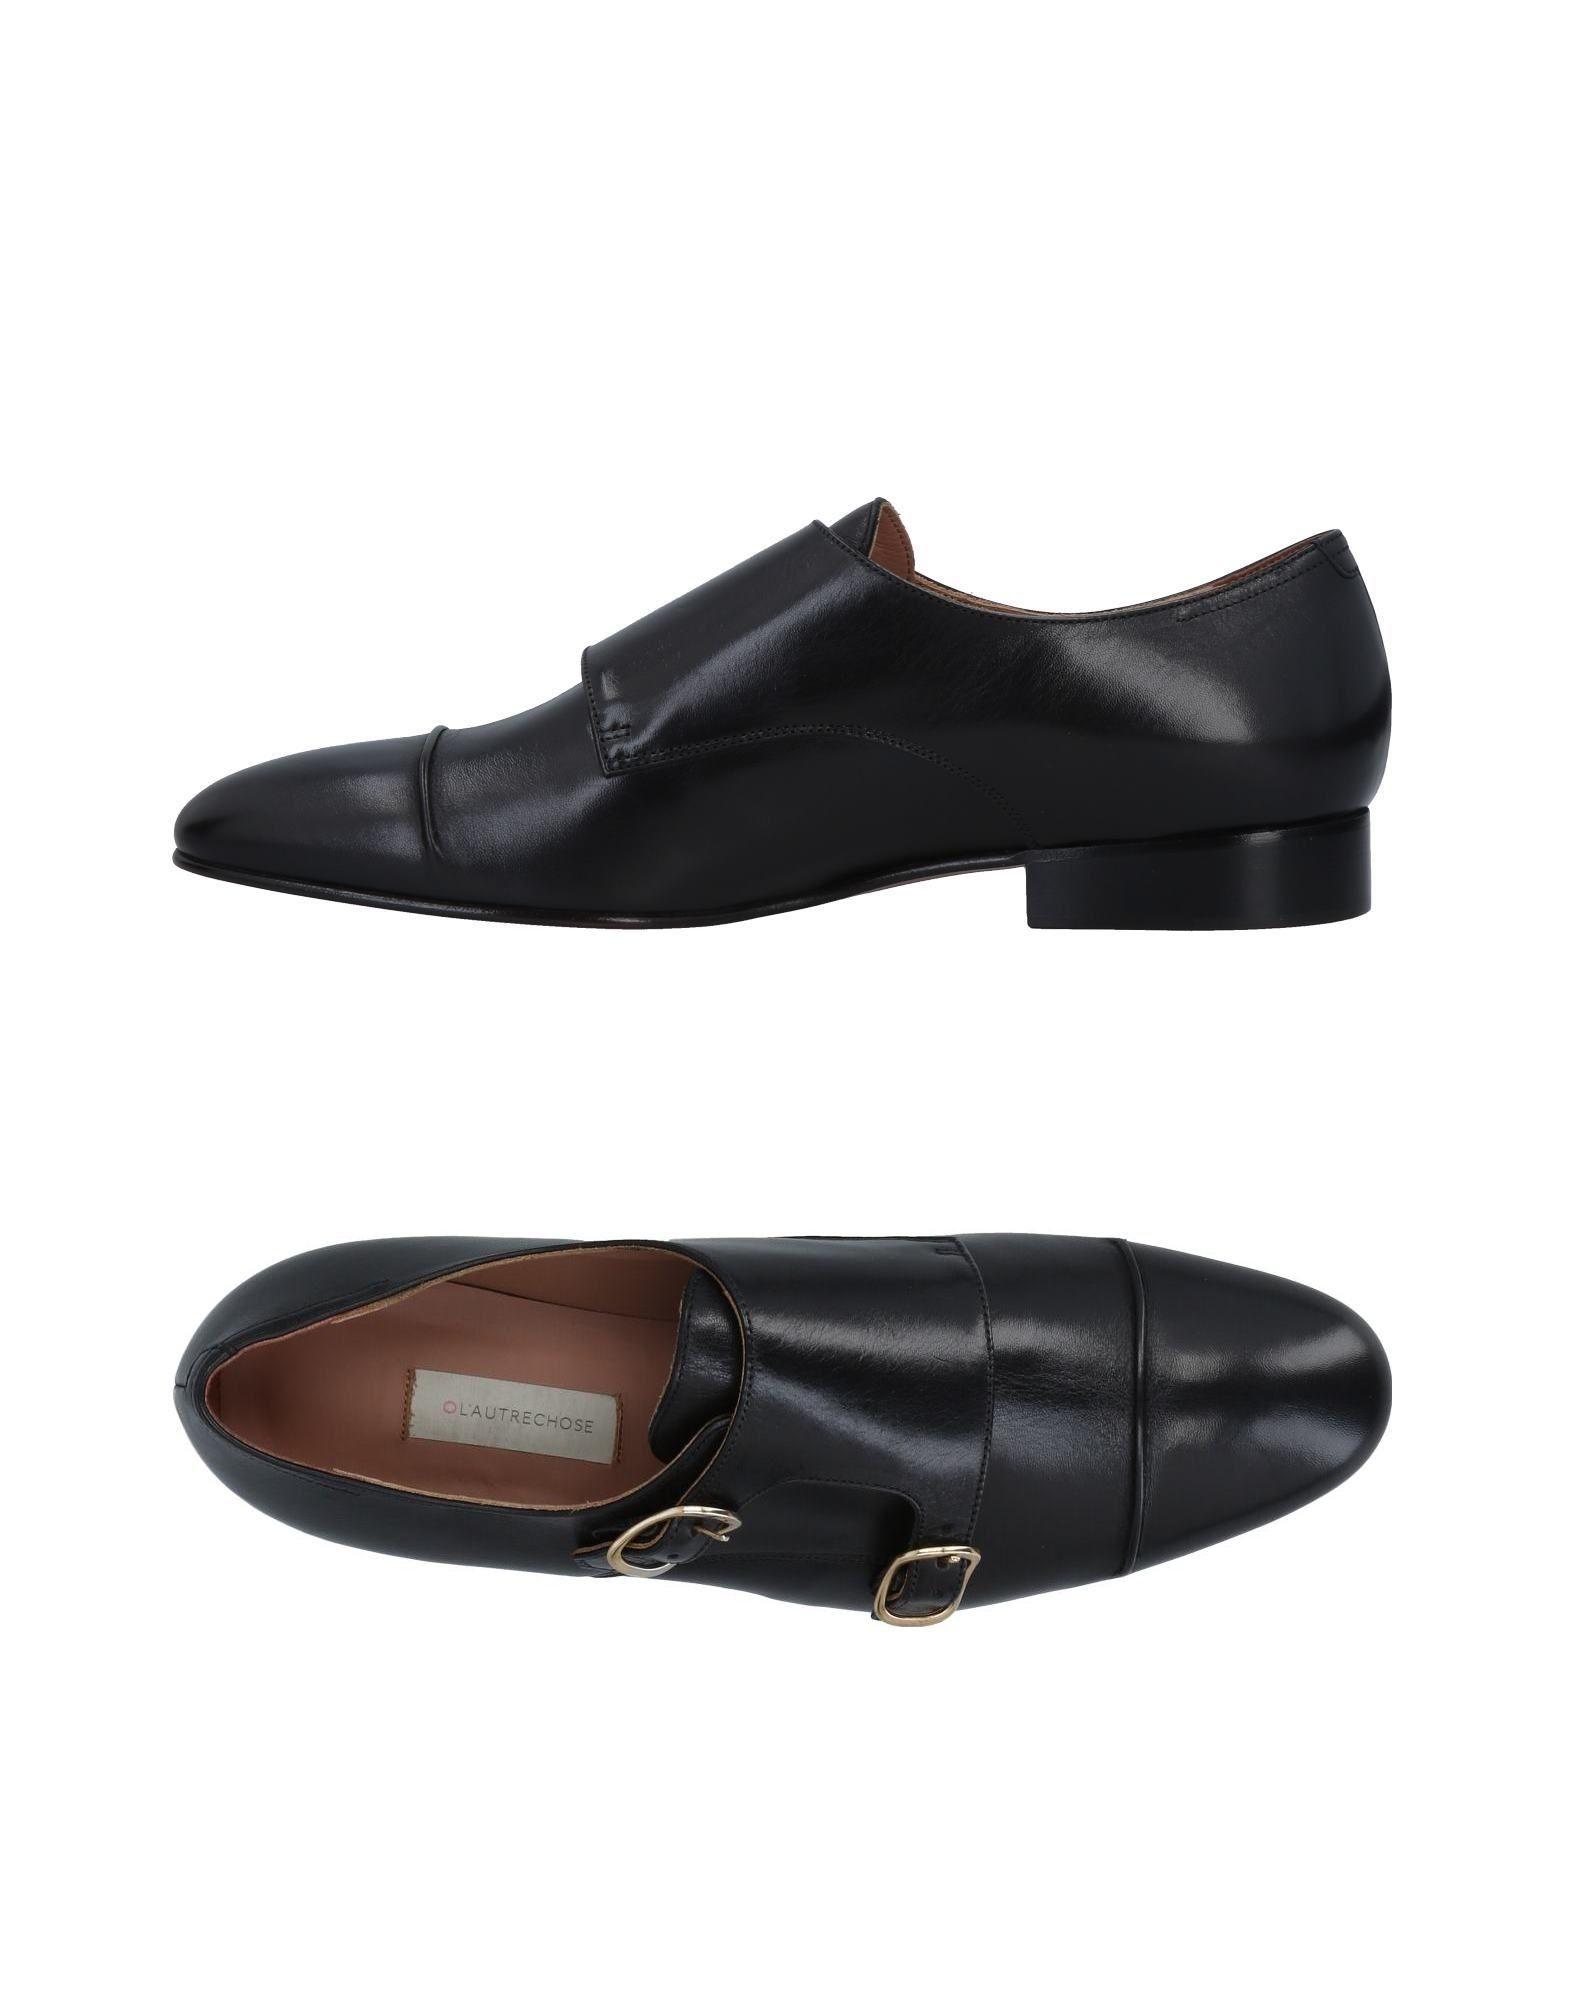 L' Autre Chose Mokassins Damen  11487383RJGut aussehende strapazierfähige Schuhe